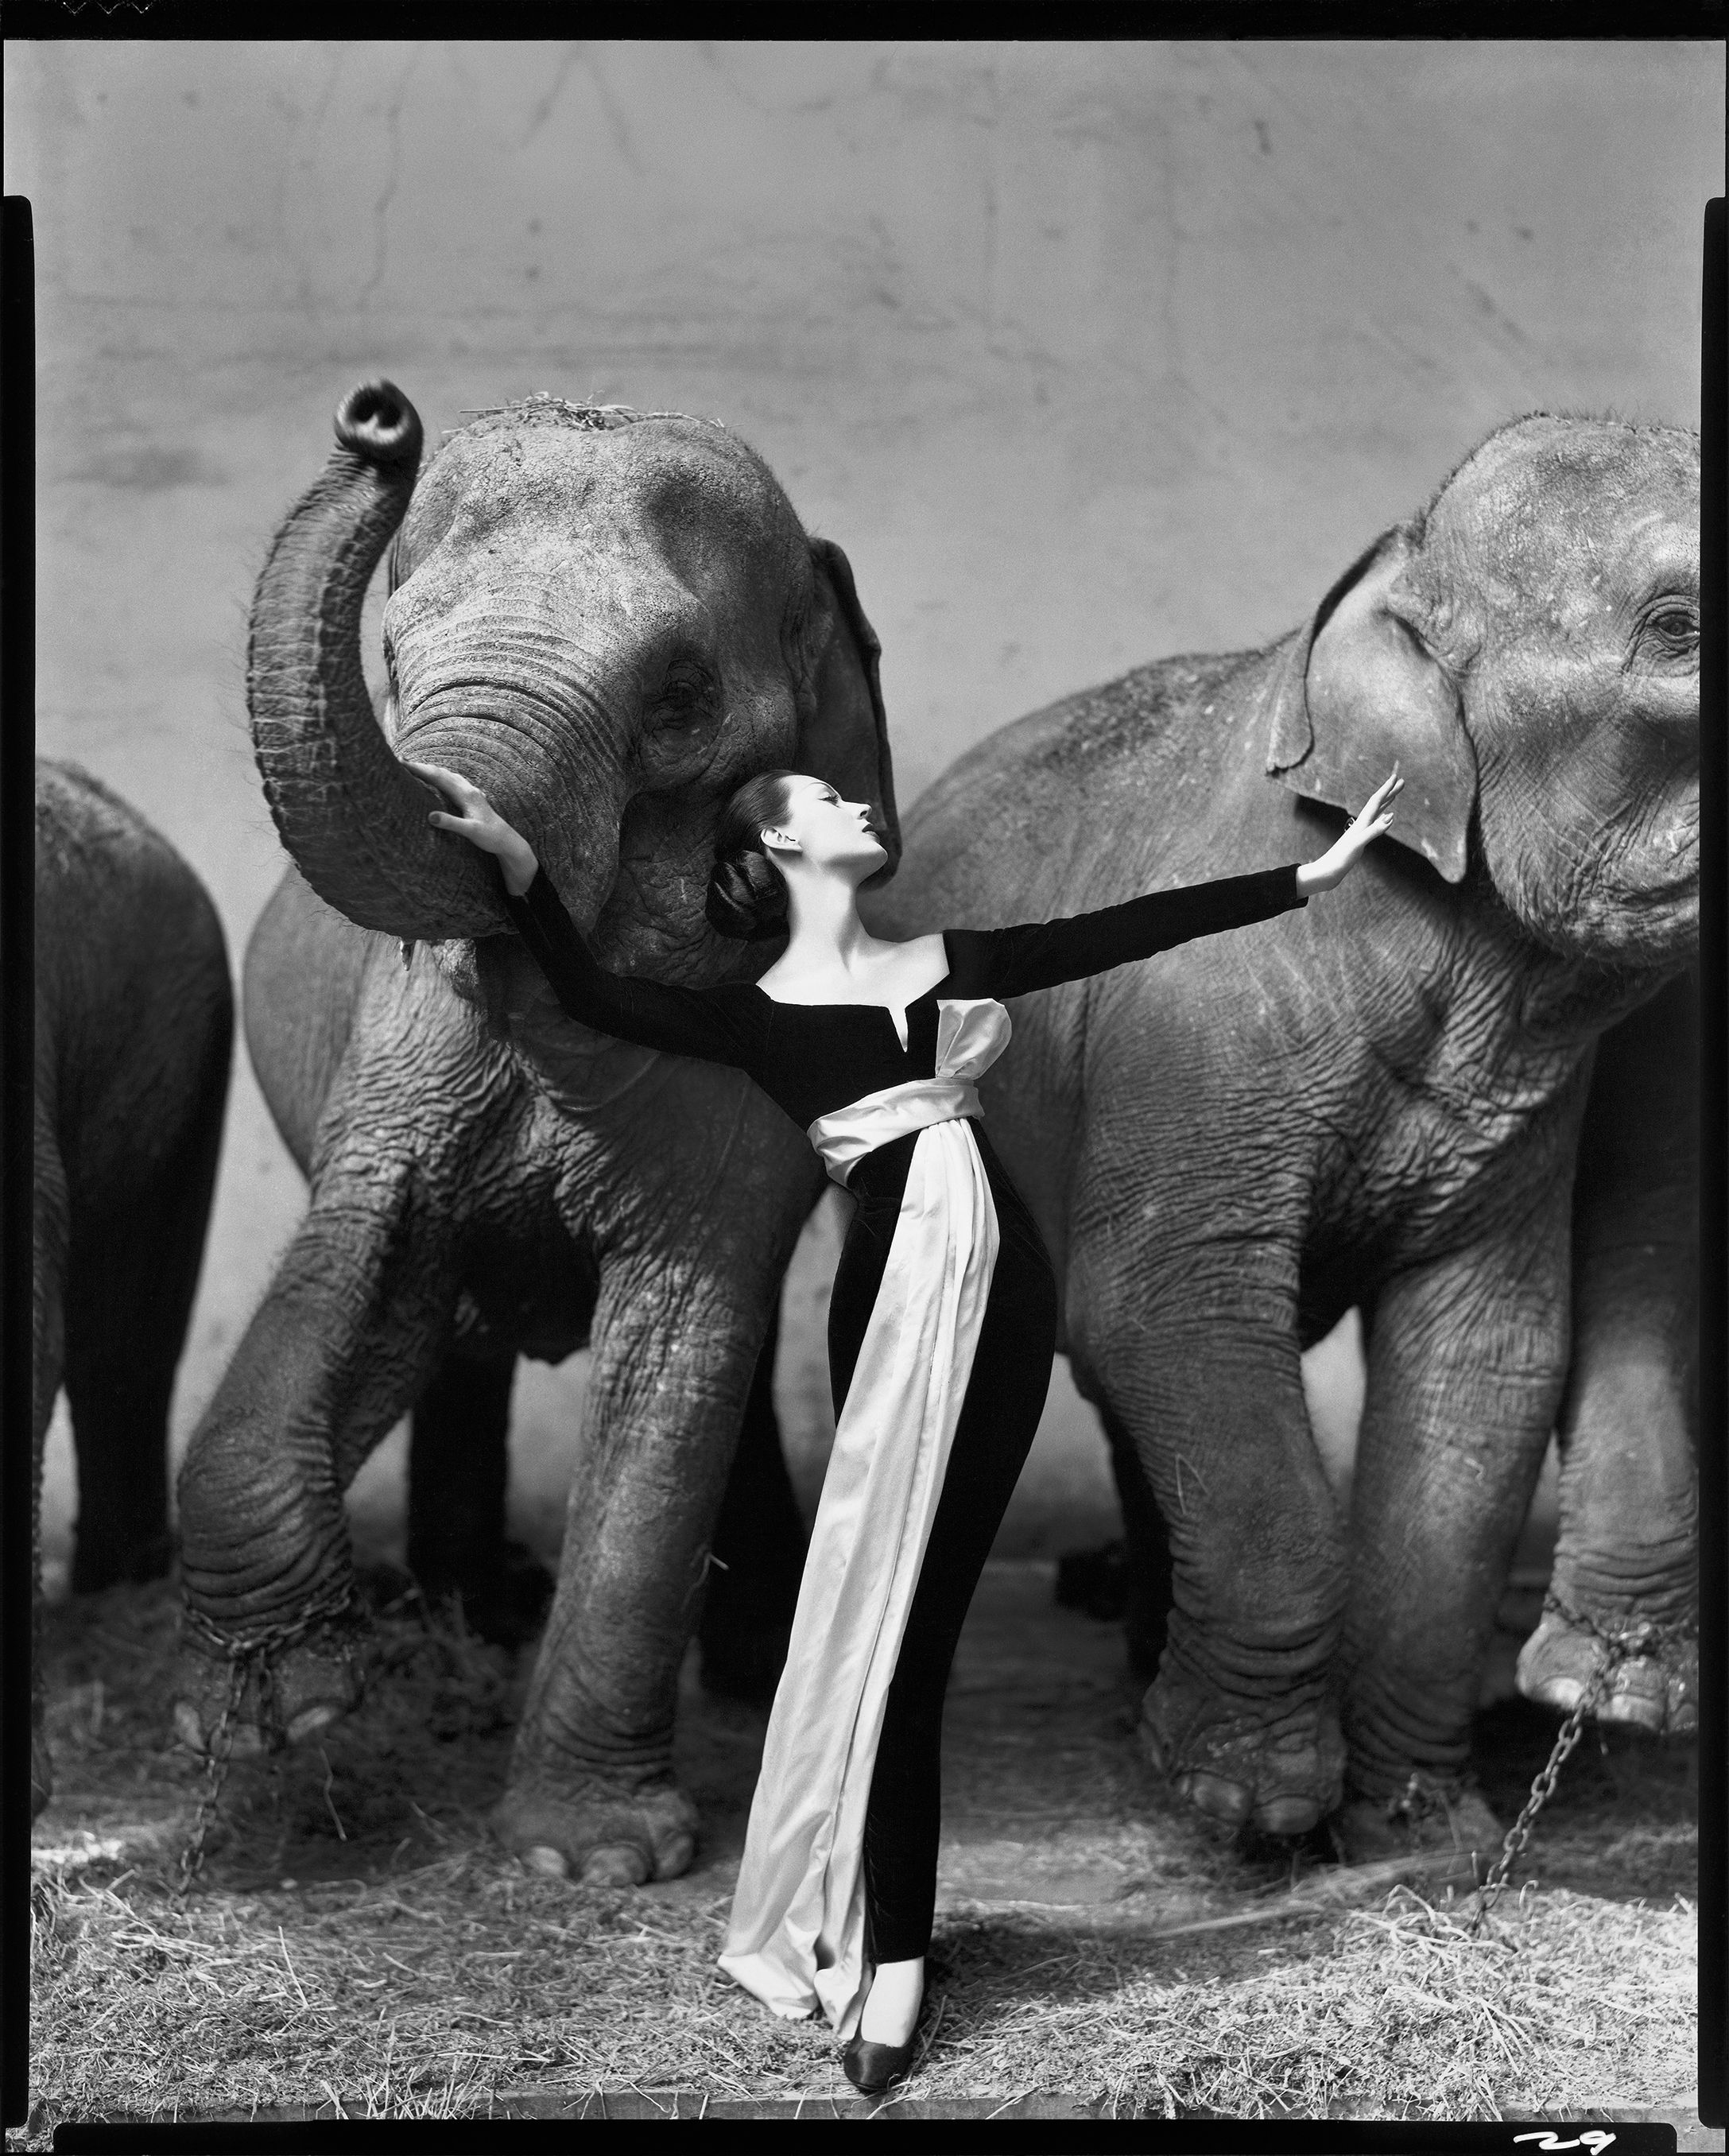 Harper\u0027s BAZAAR Photographs From 1950s , Richard Avedon